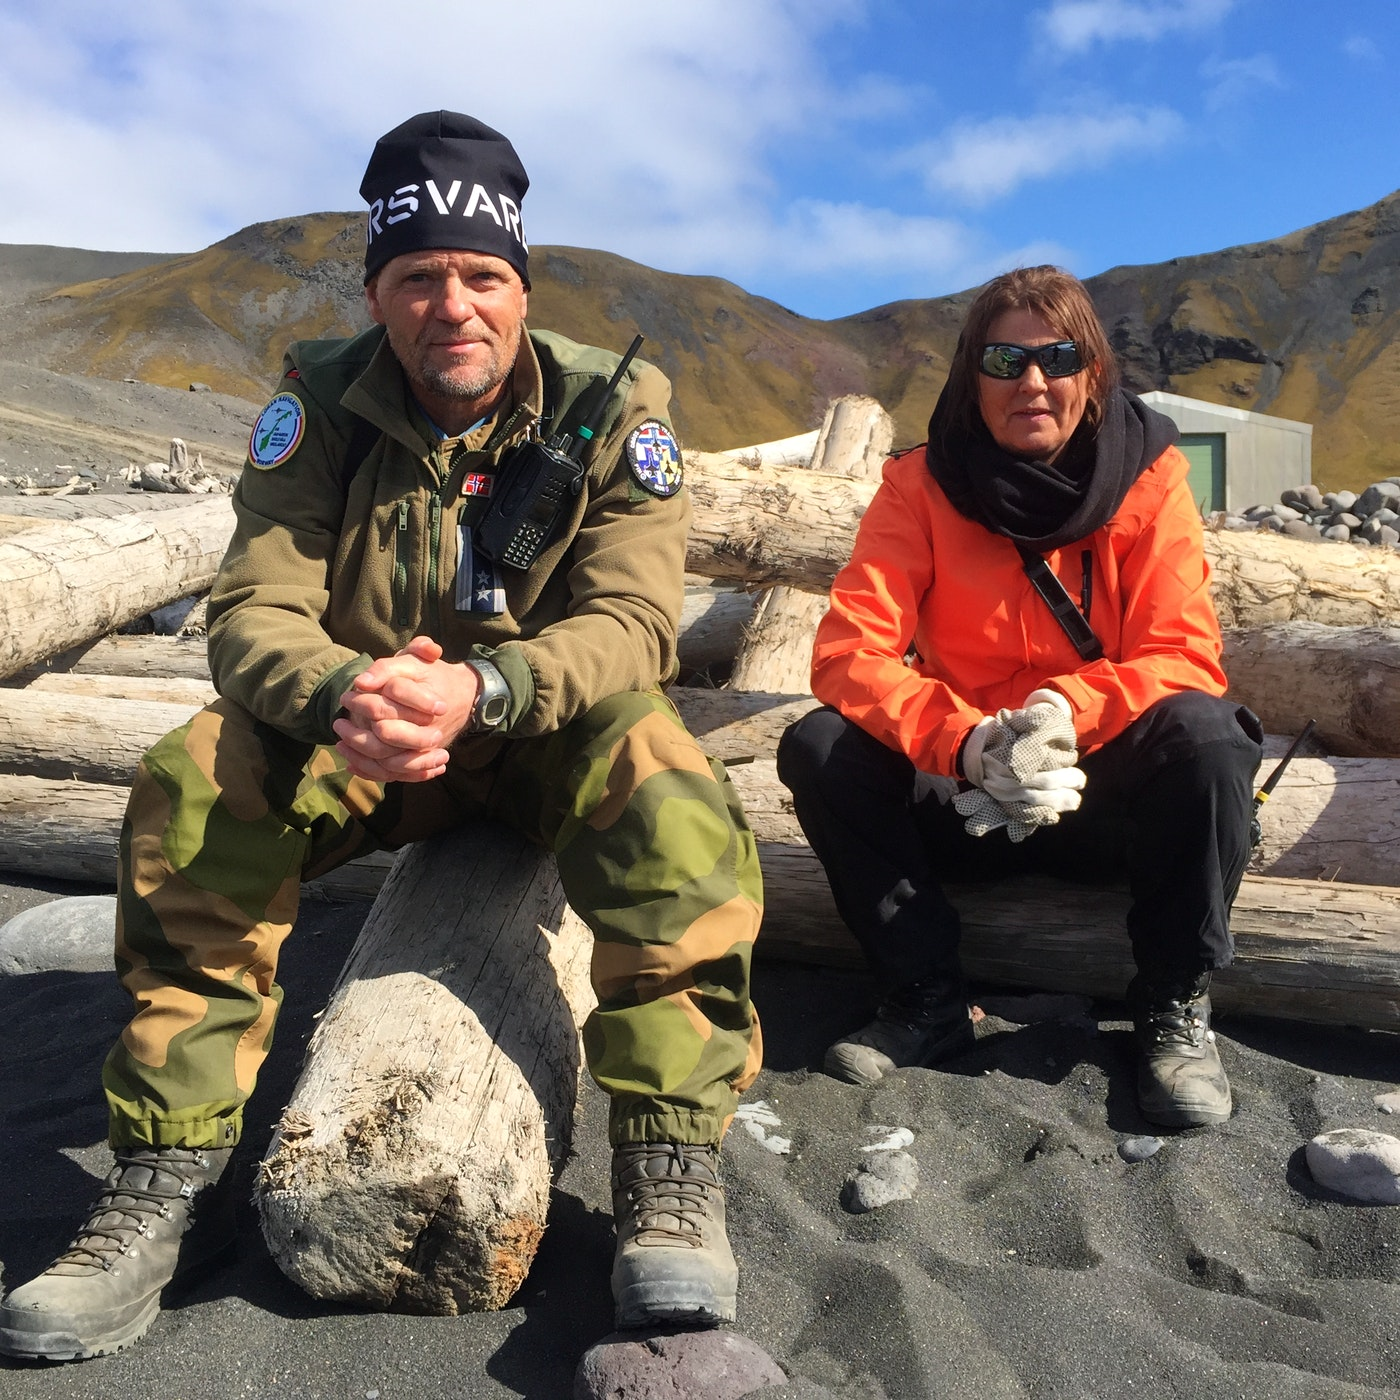 Station commander Wiggo Johansen and nurse Siw Landro. (Jennifer Kingsley)